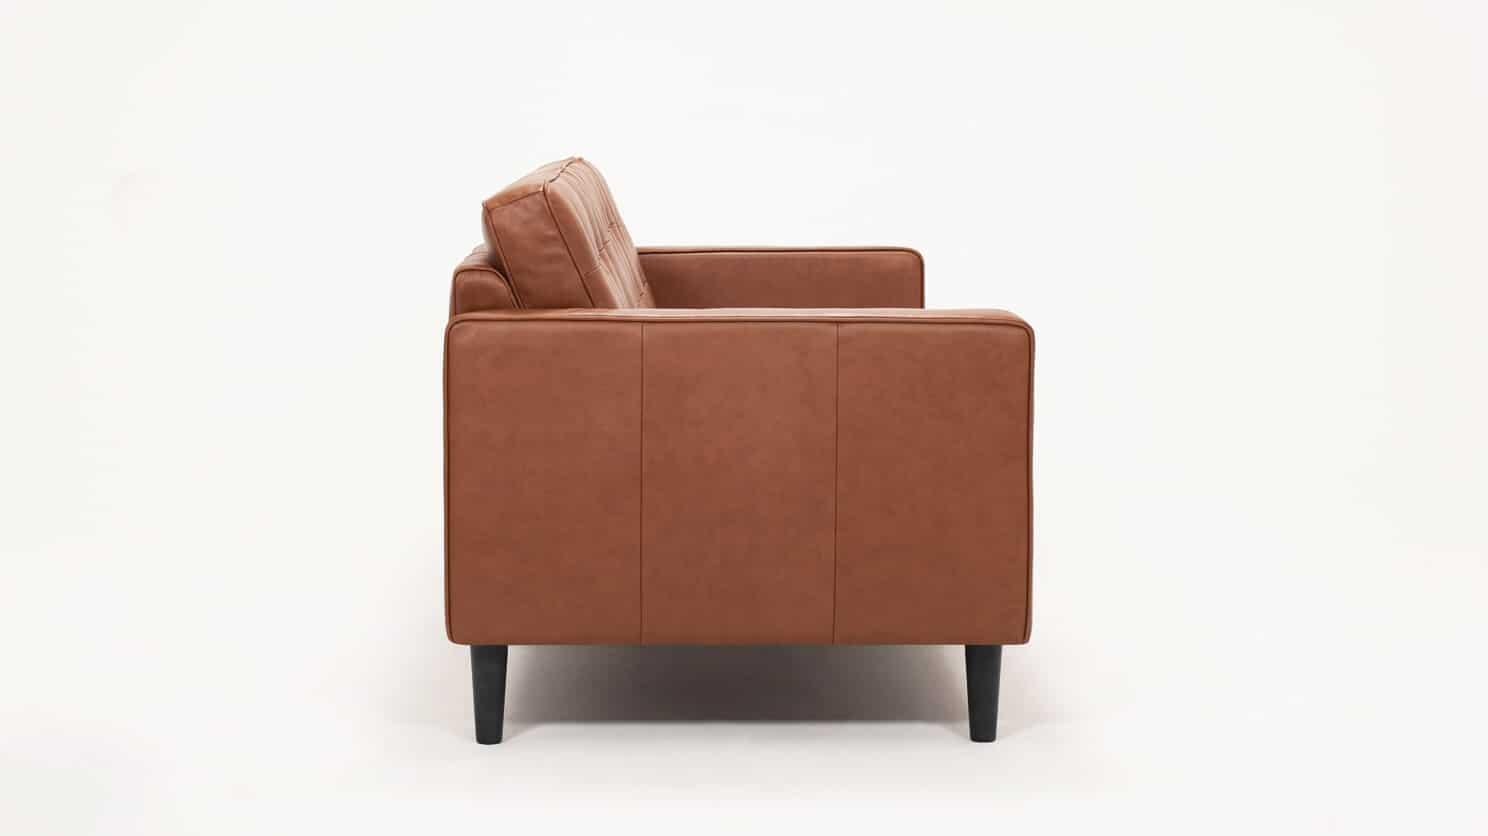 Large Leather Sofa Side